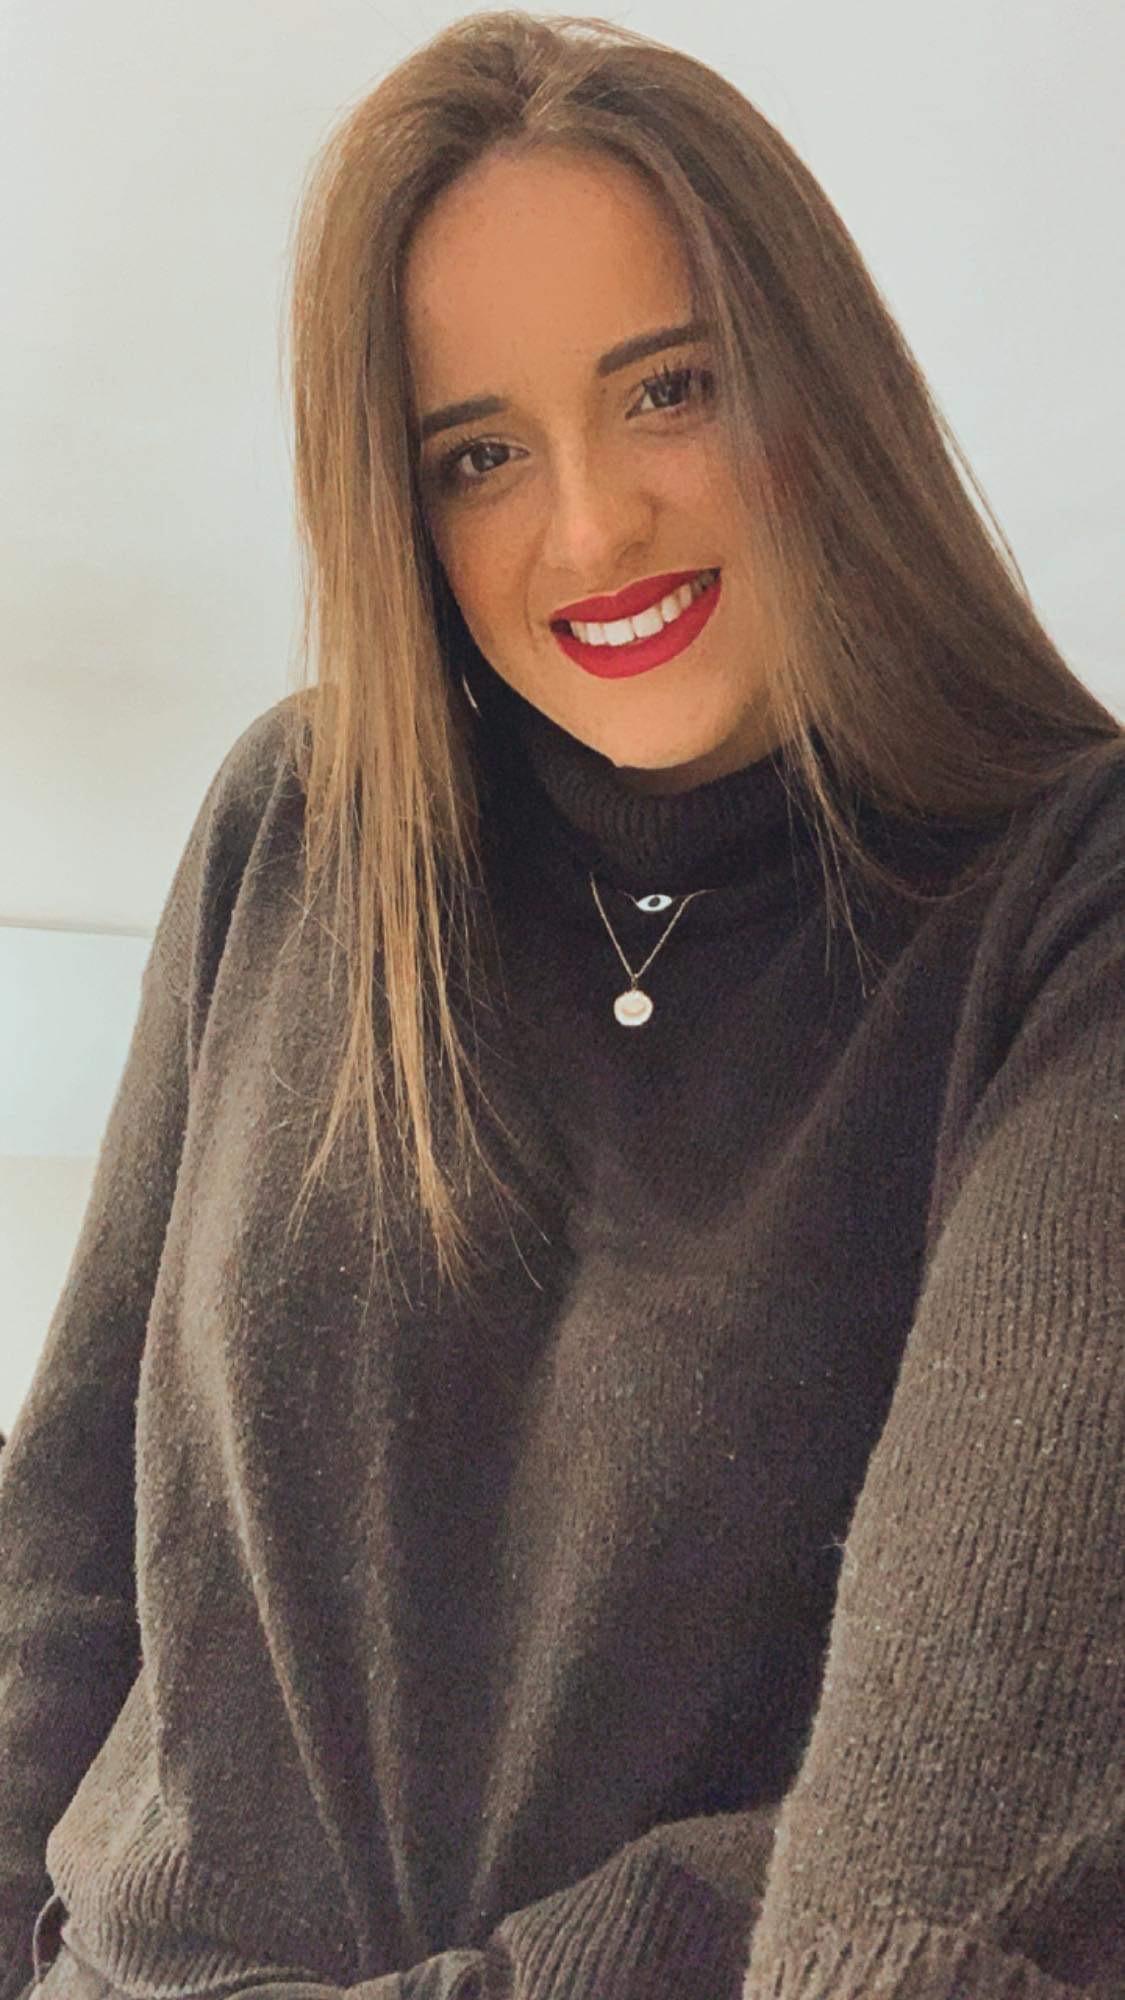 Emilia Chachah